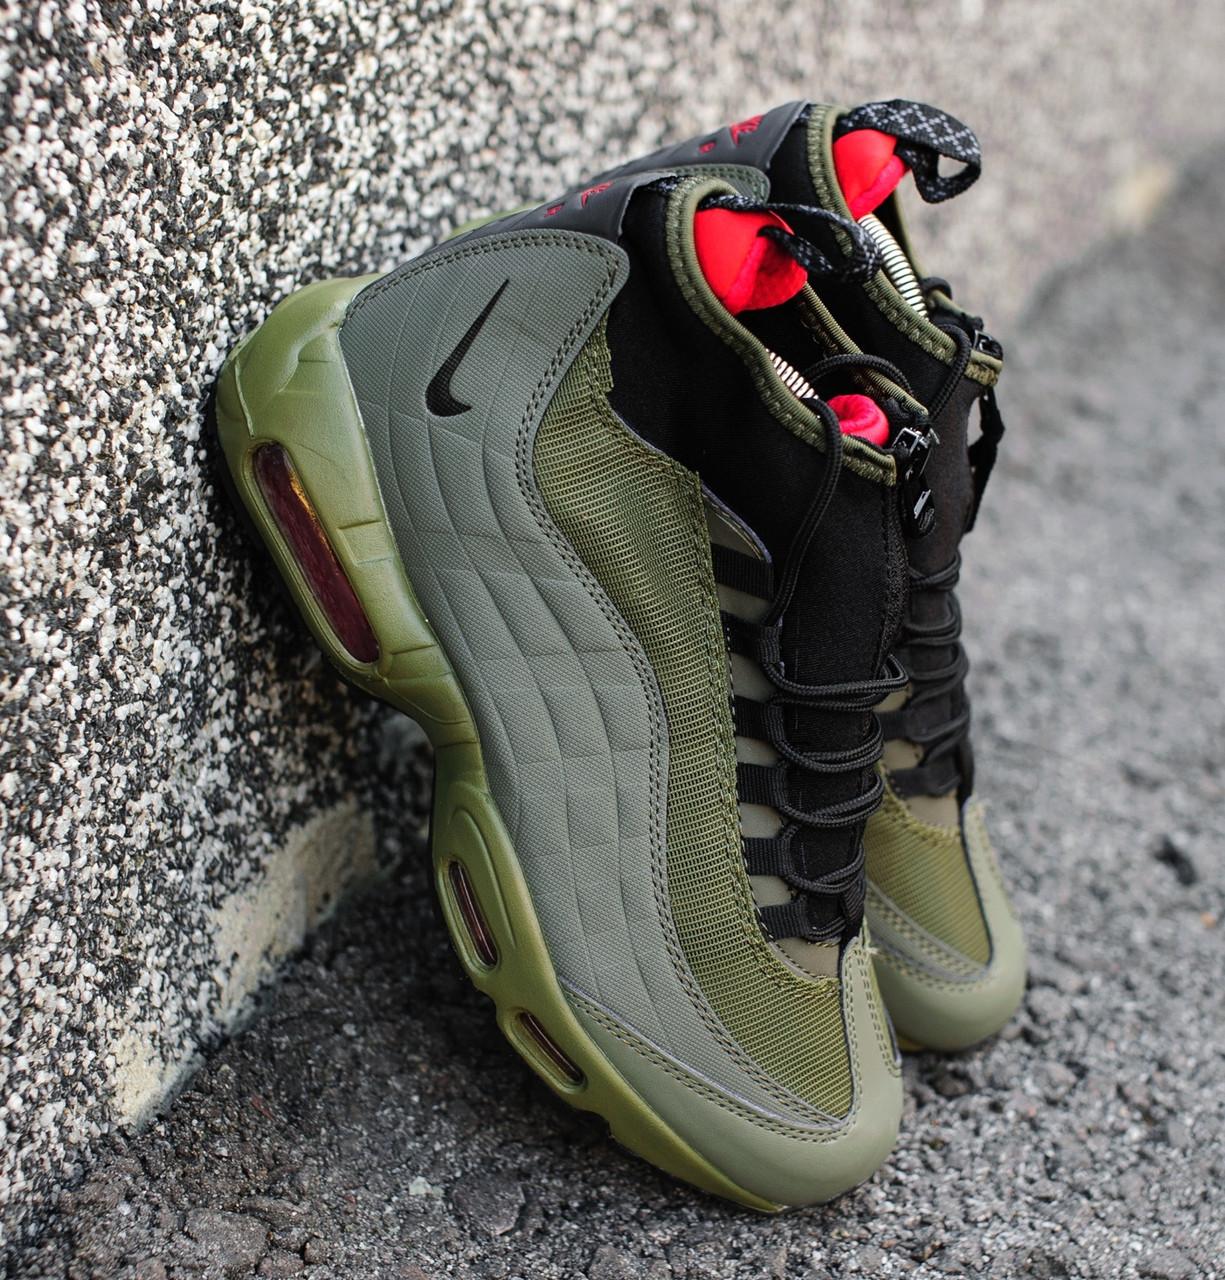 Мужские утепленные кроссовки в стиле Nike Air Max 95 Sneakerboot Green 6955d88ddb5